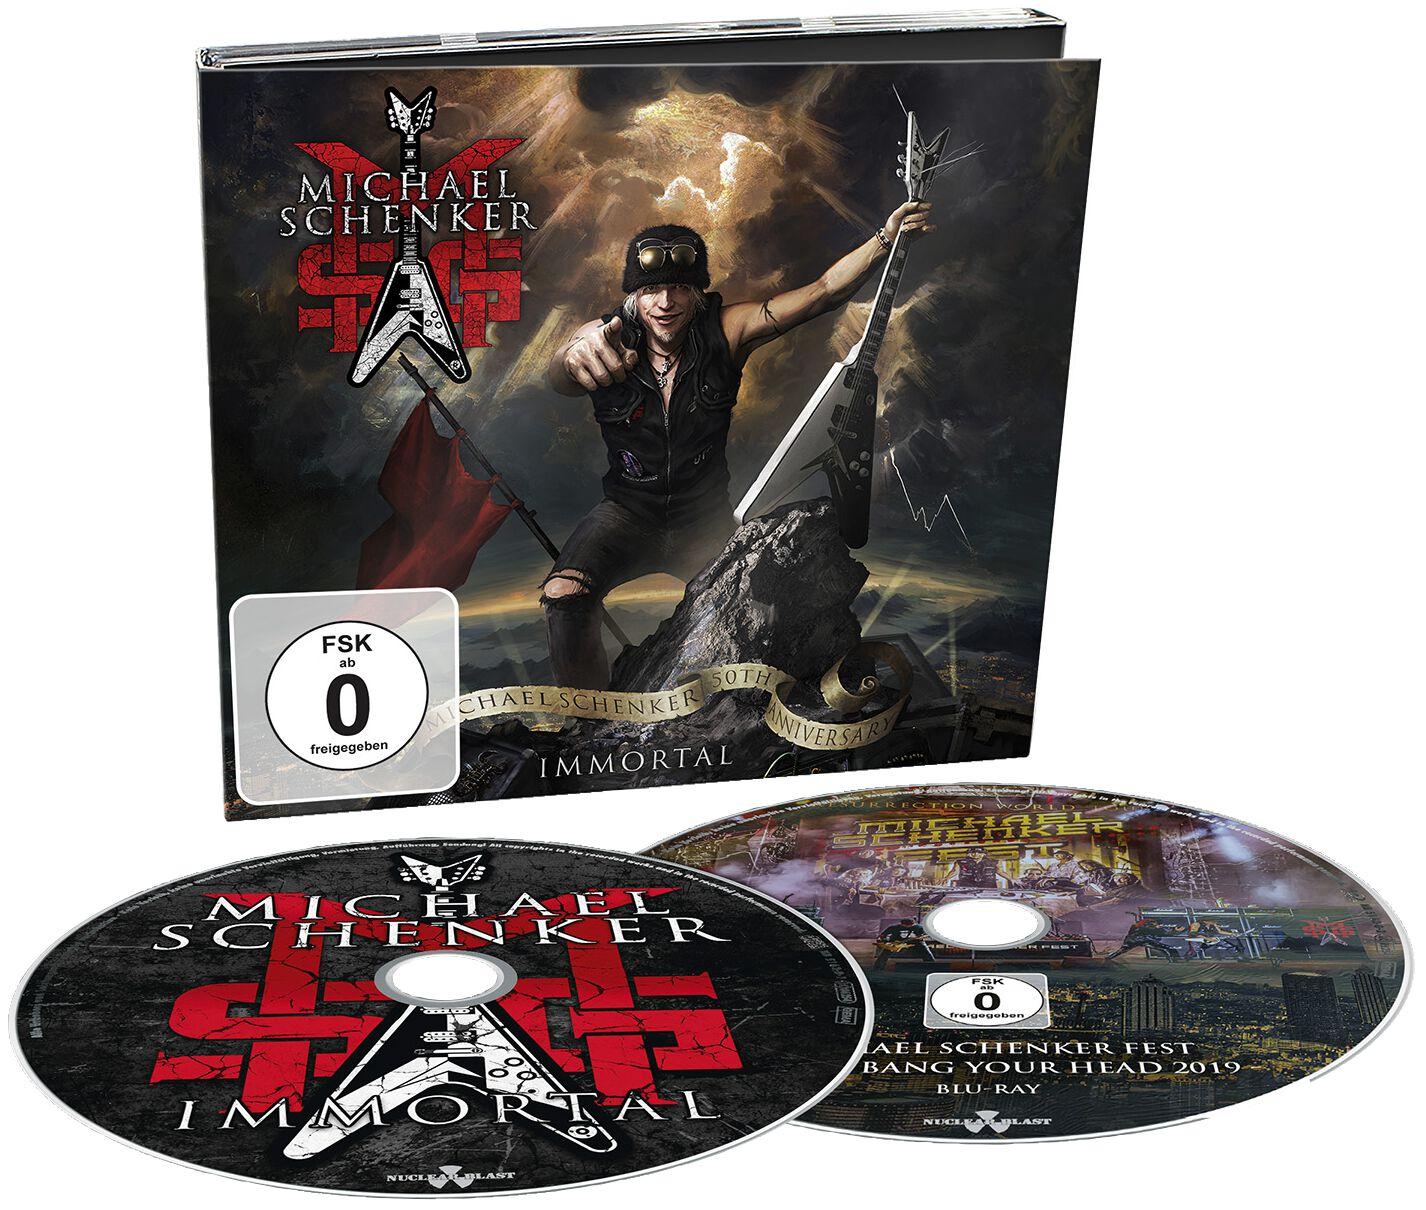 Image of Michael Schenker Group Immortal CD & Blu-ray Standard